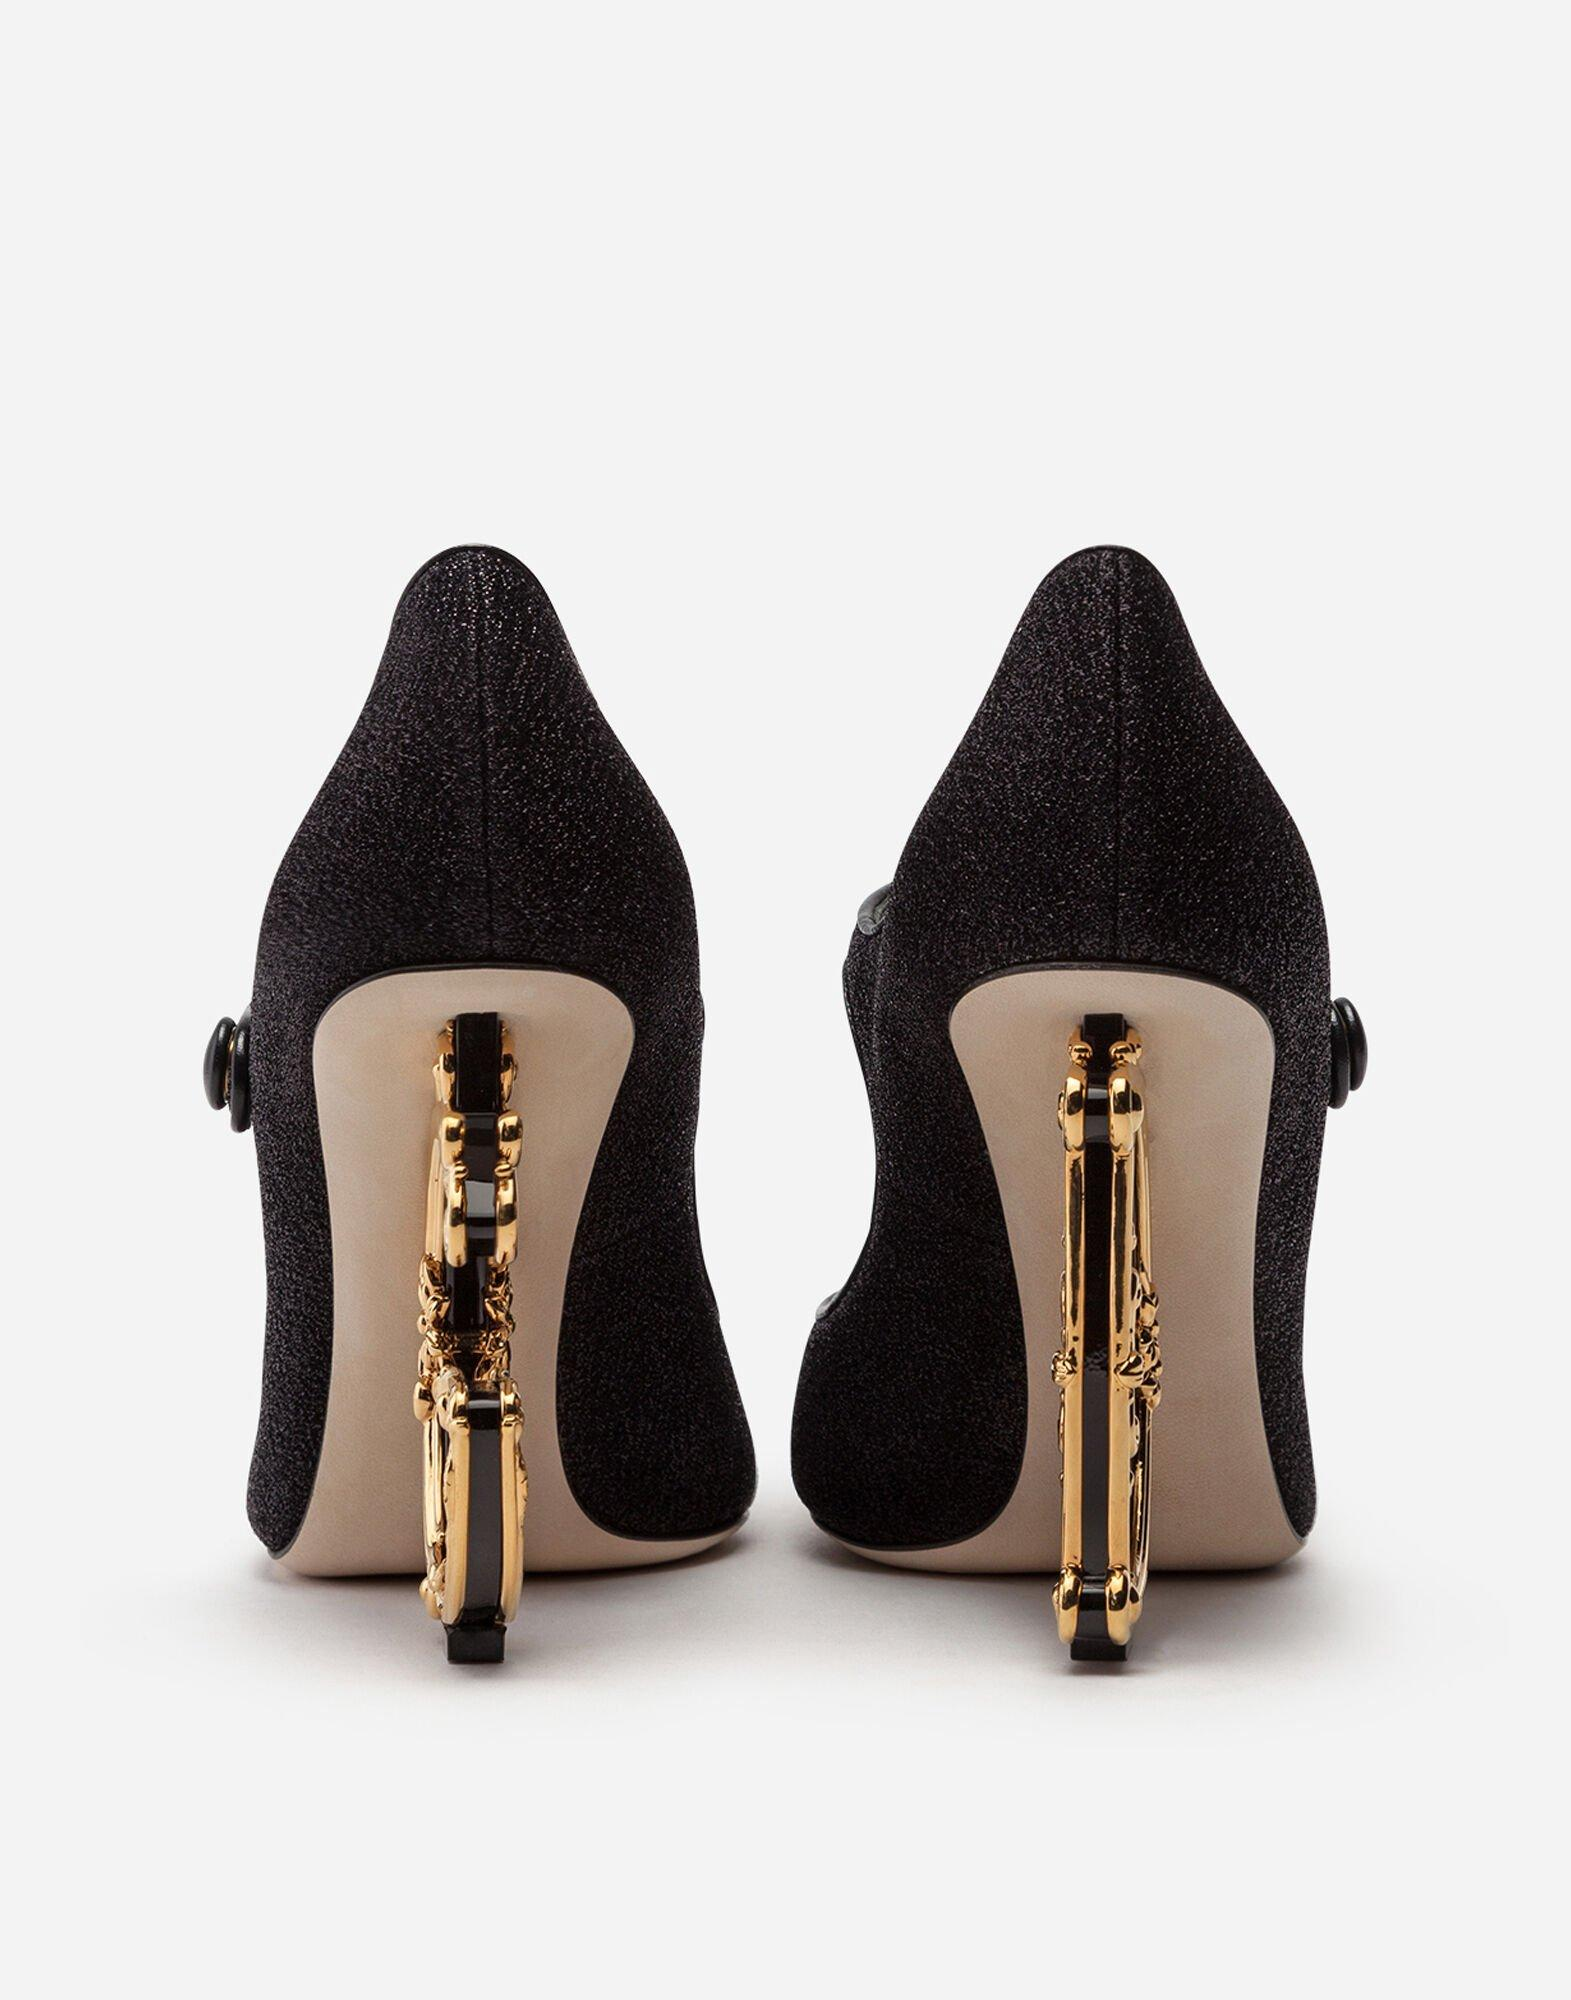 Merceditas De Lúrex Con Tacón Escultura Dolce & Gabbana de Tejido sintético de color Negro